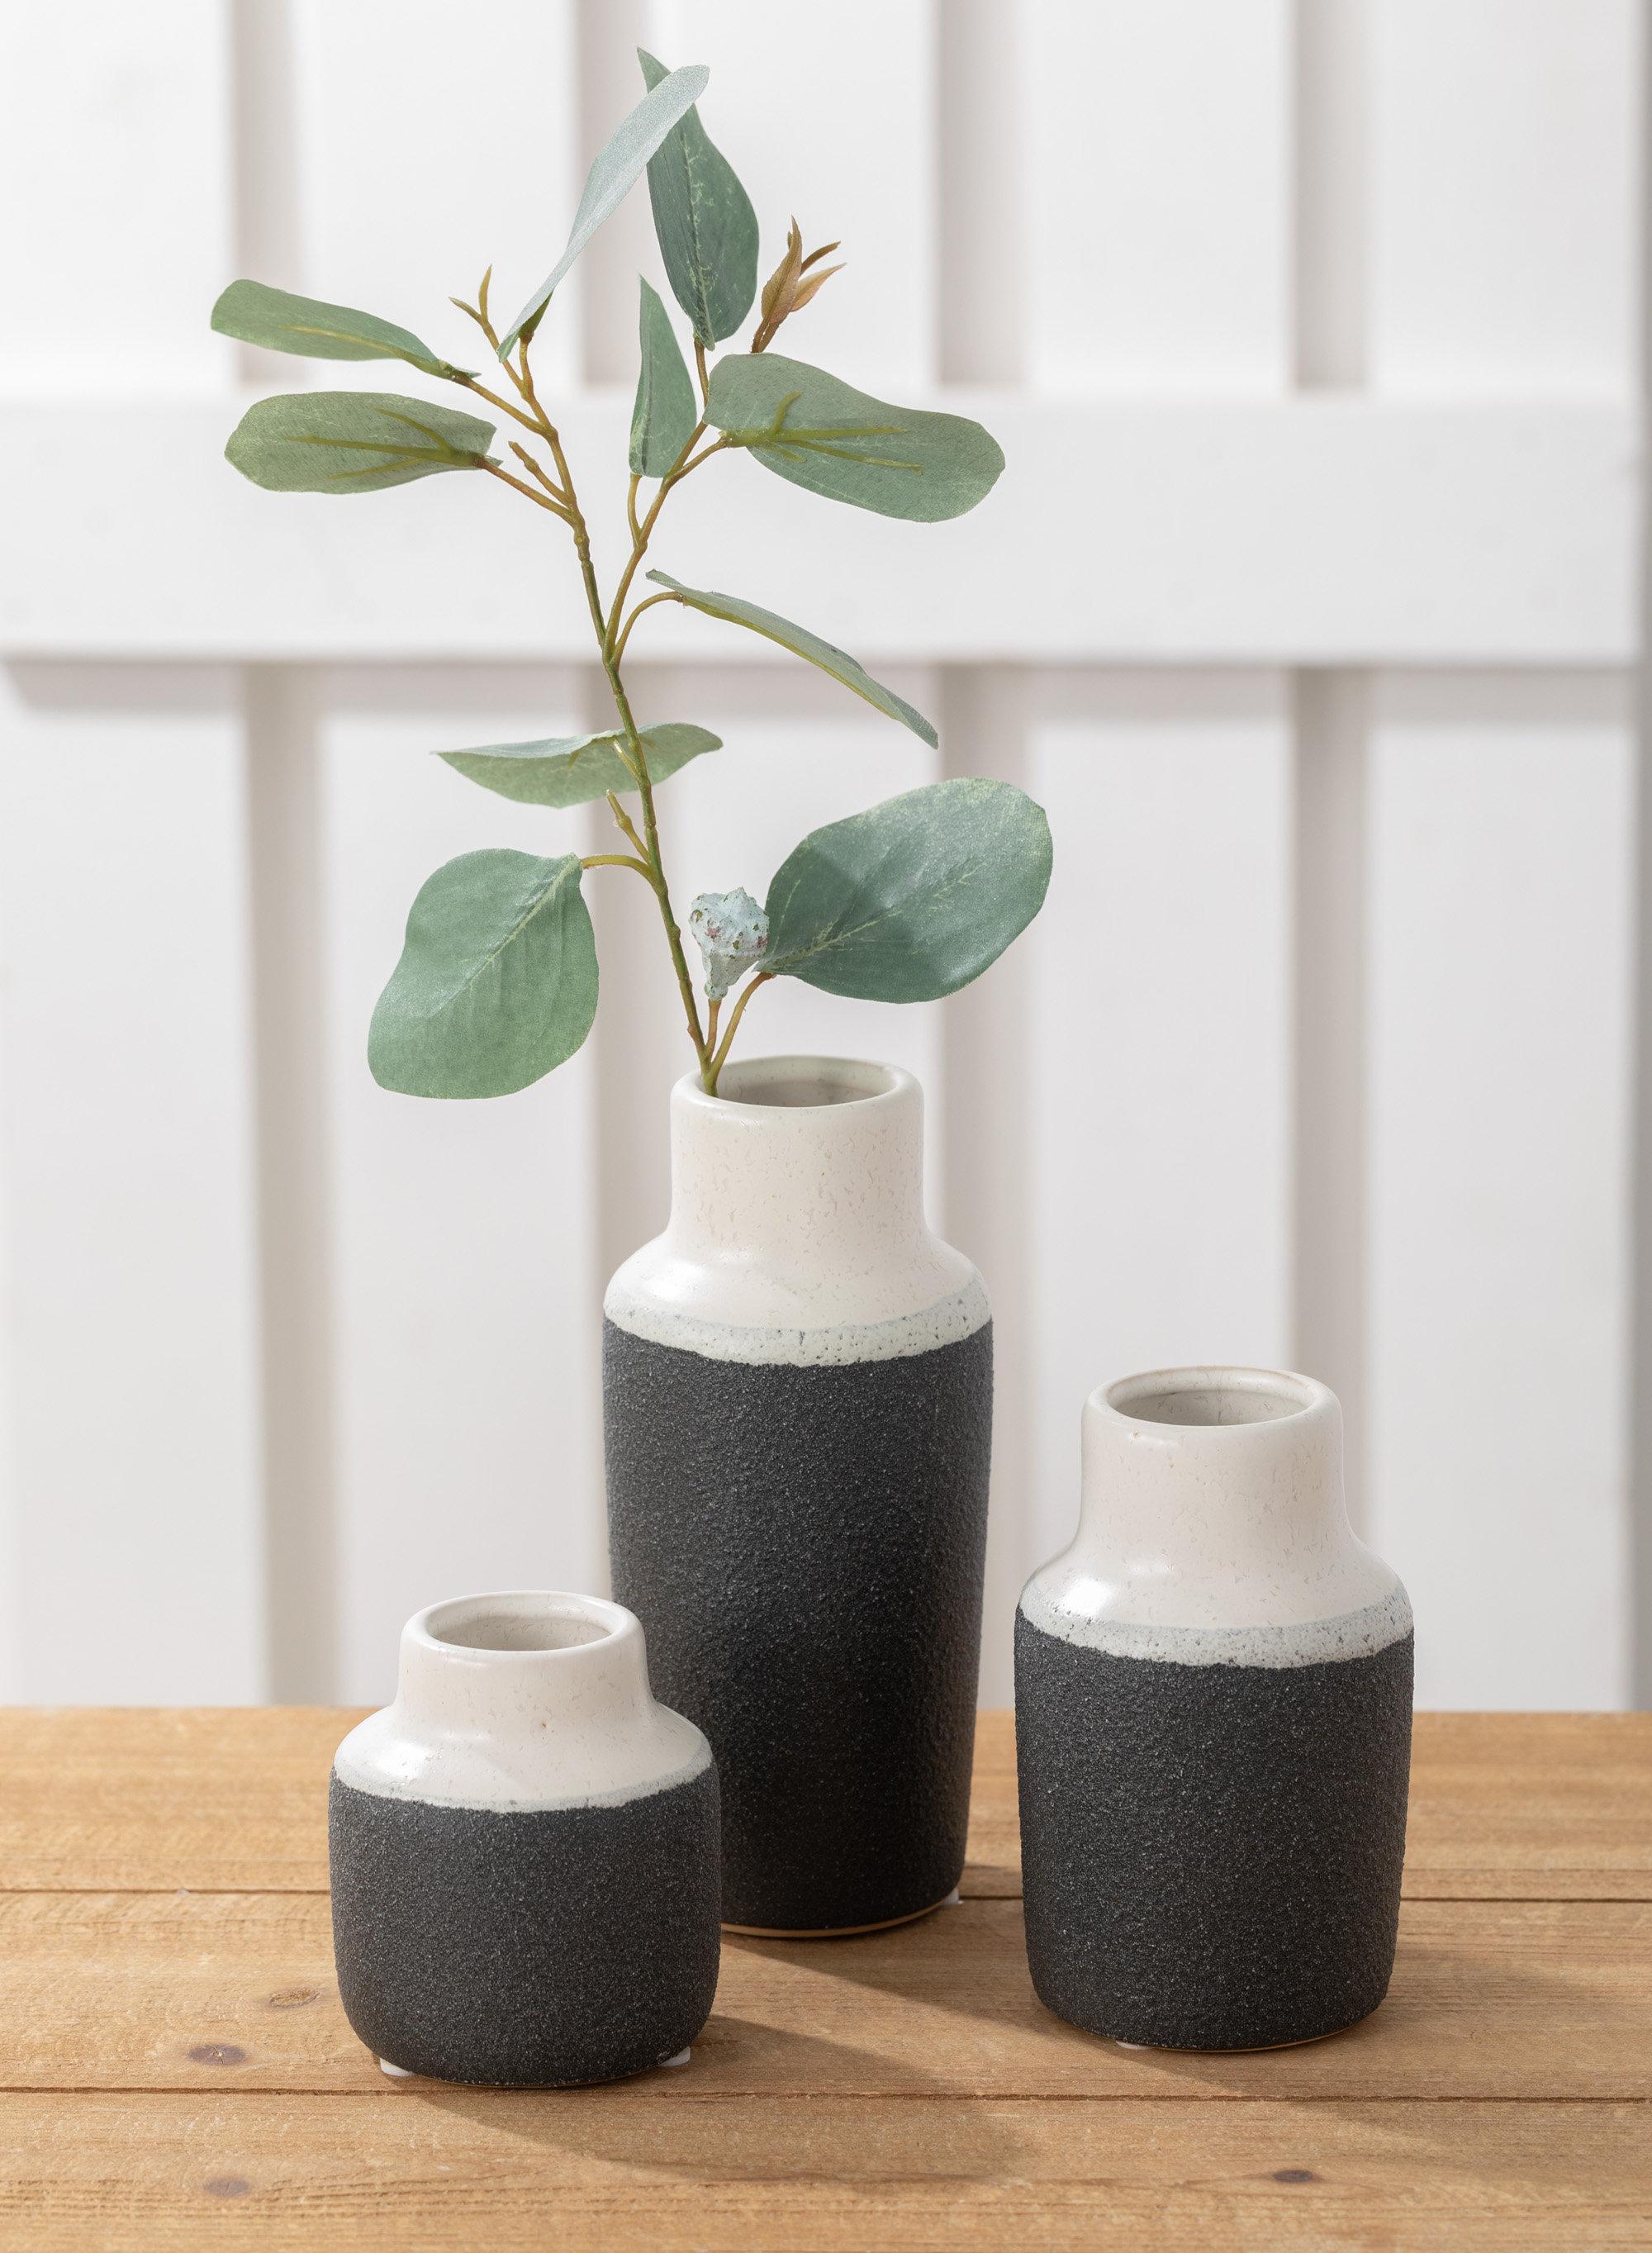 George Oliver 3 Piece Sandiford White Black Indoor Outdoor Ceramic Table Vase Set Reviews Wayfair